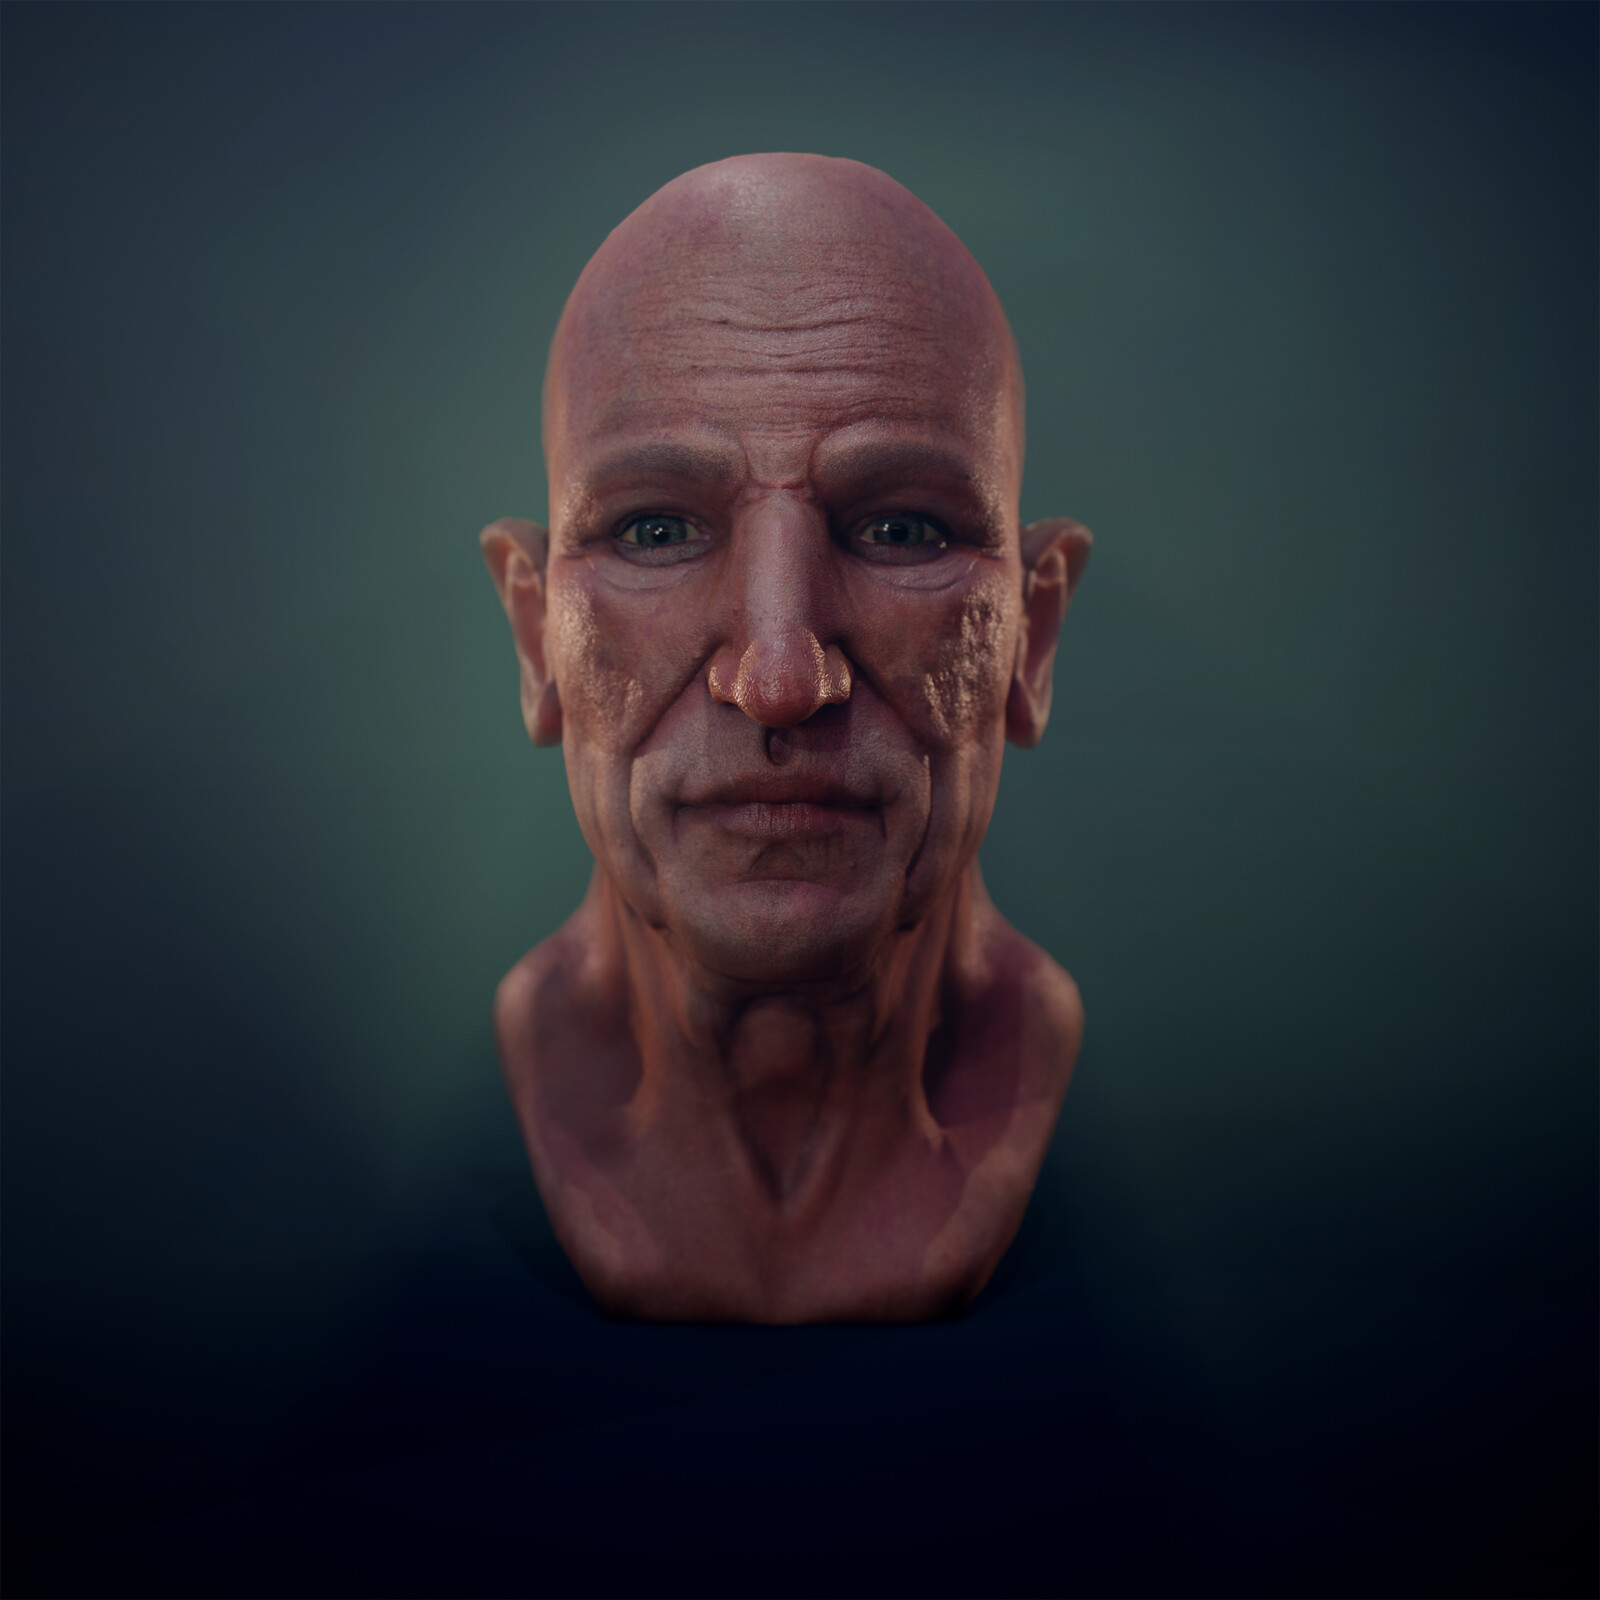 Anatomy of Ageing Head Sculpt Study - WIP